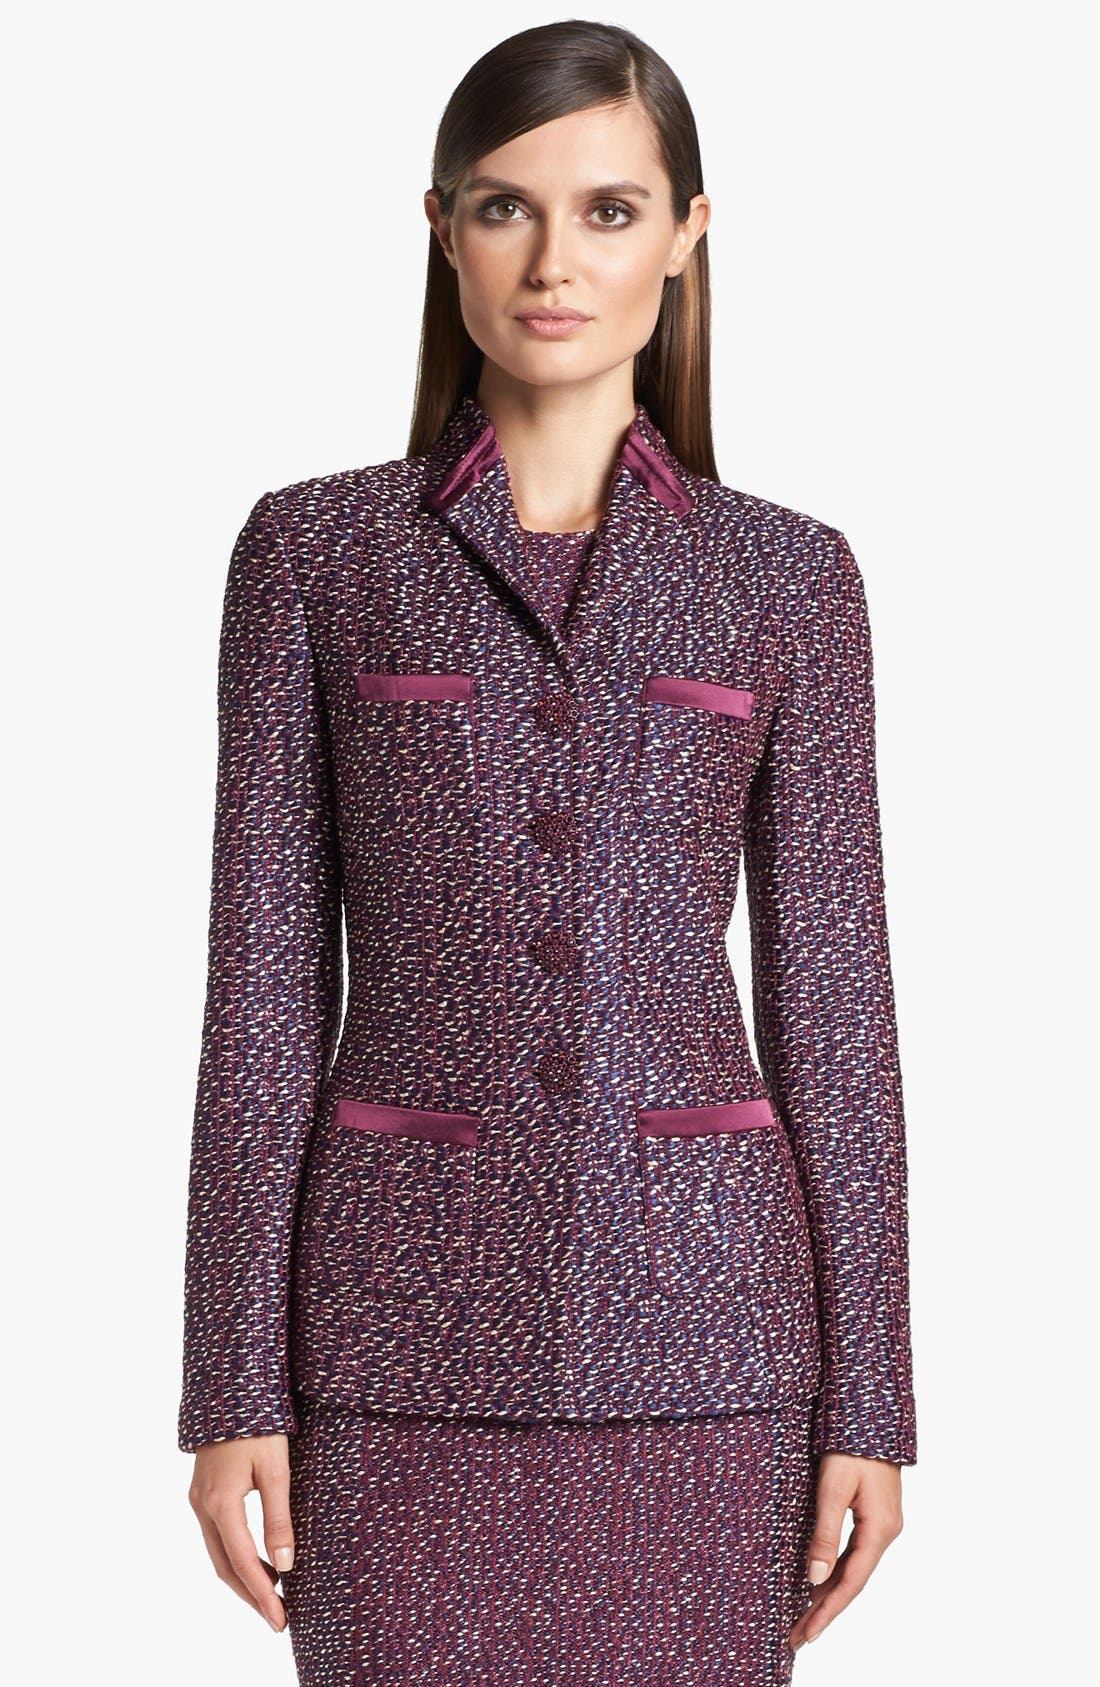 Alternate Image 1 Selected - St. John Collection Dash Tweed Knit Jacket